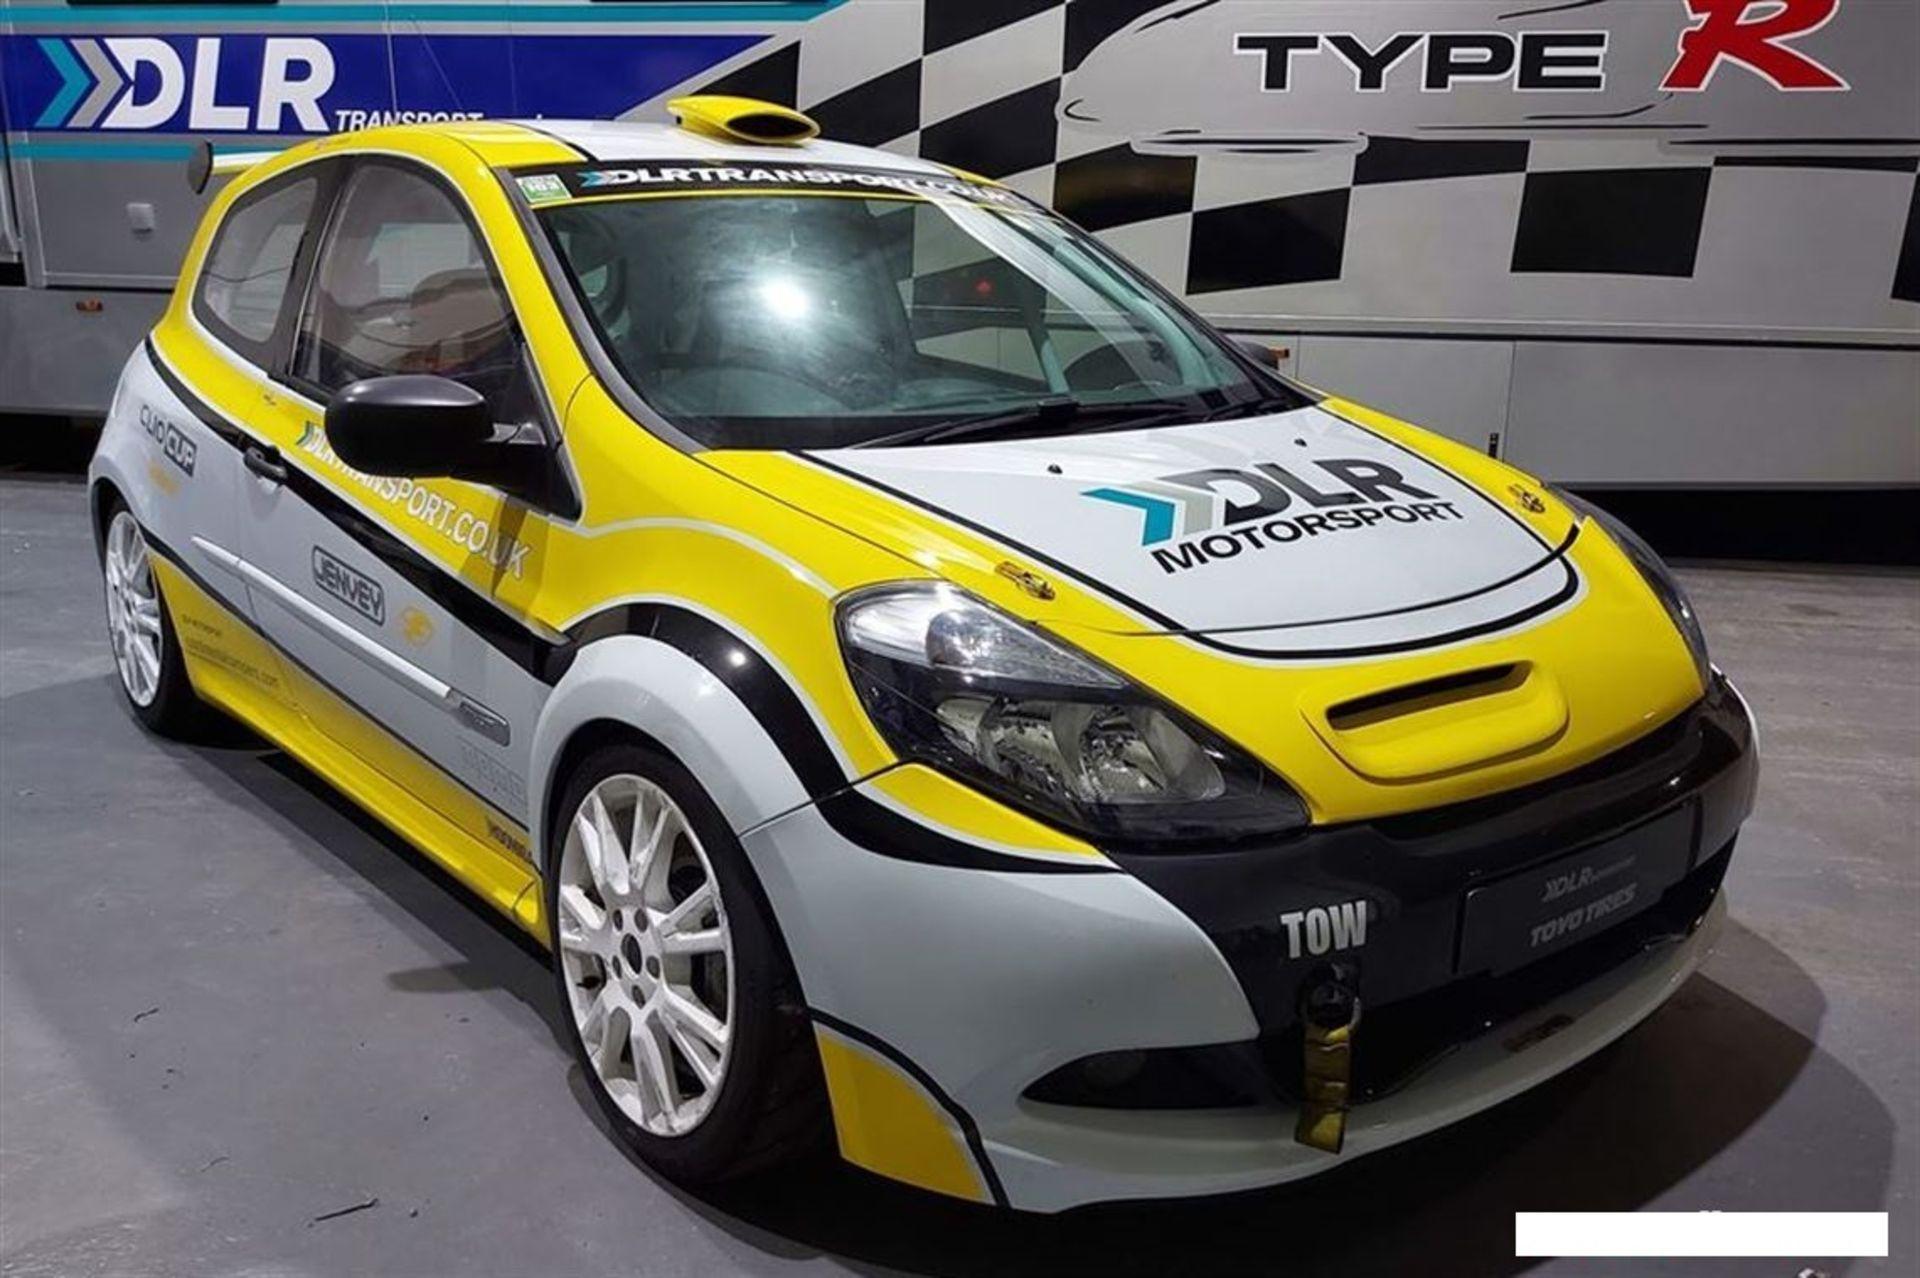 CLIO CUP X85 RHD SADEV ON PADDLES RACE CAR